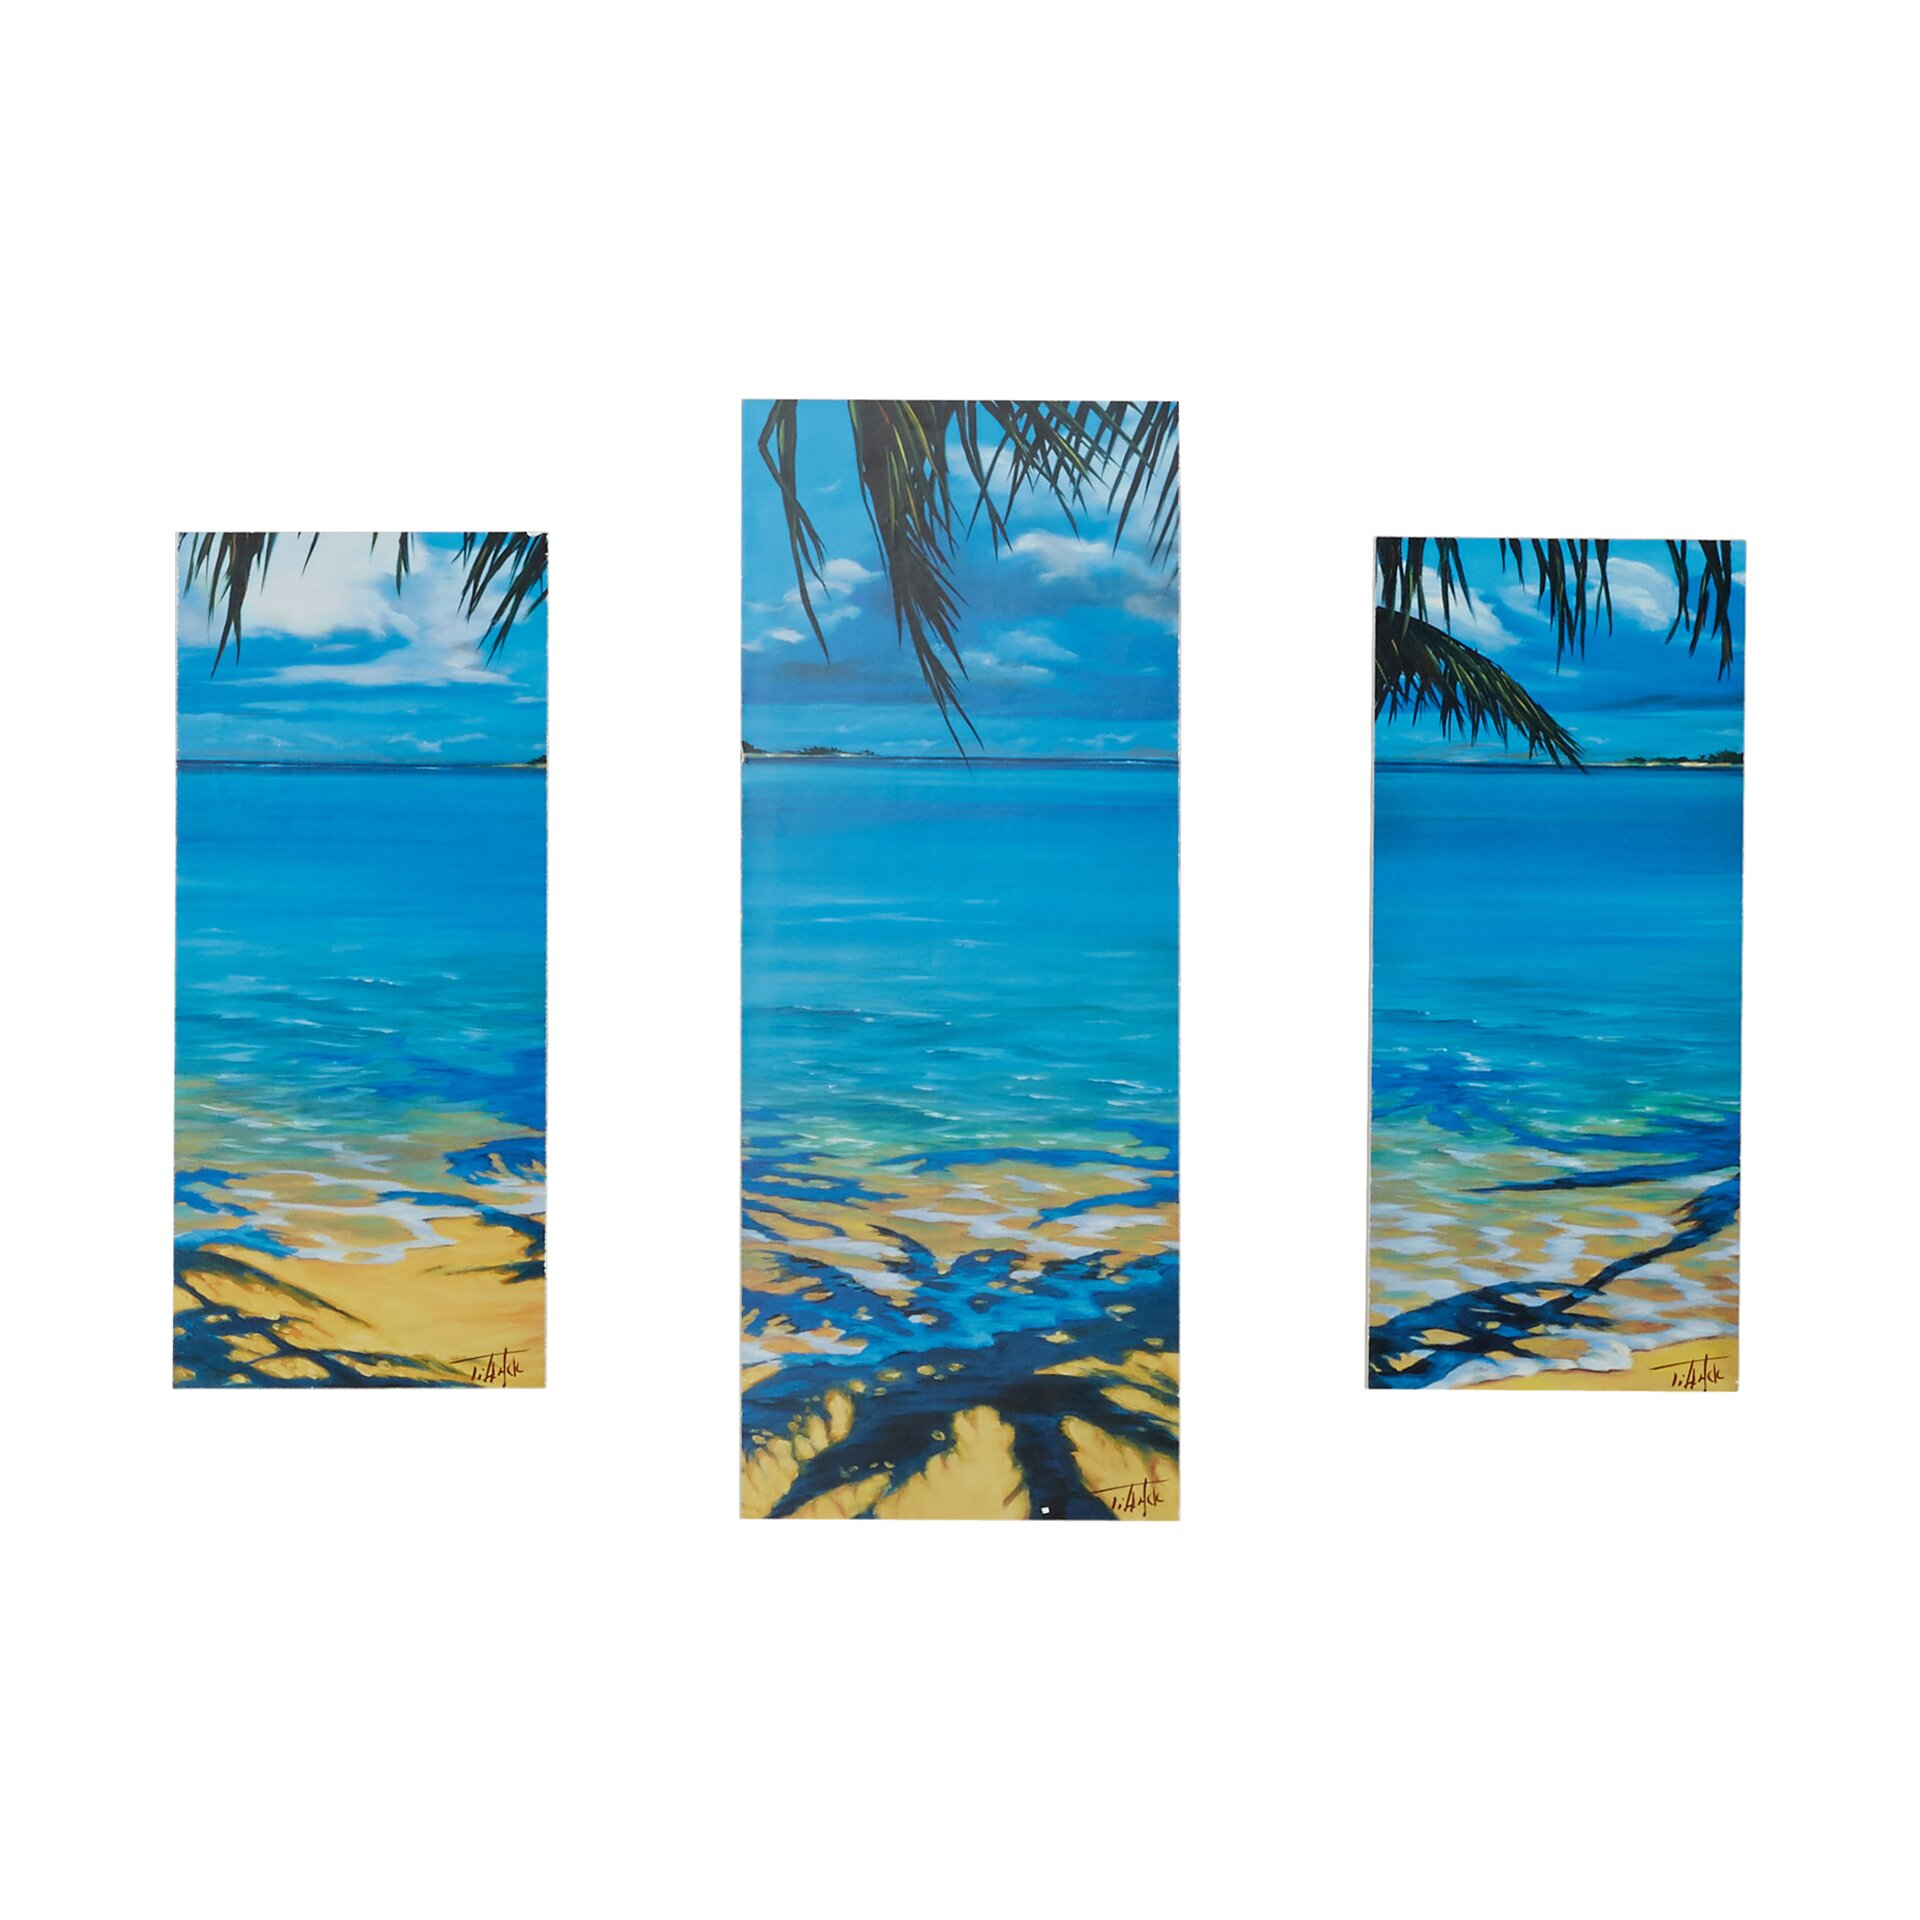 Palm tree shadows 3 piece photographic print set by beachcrest home